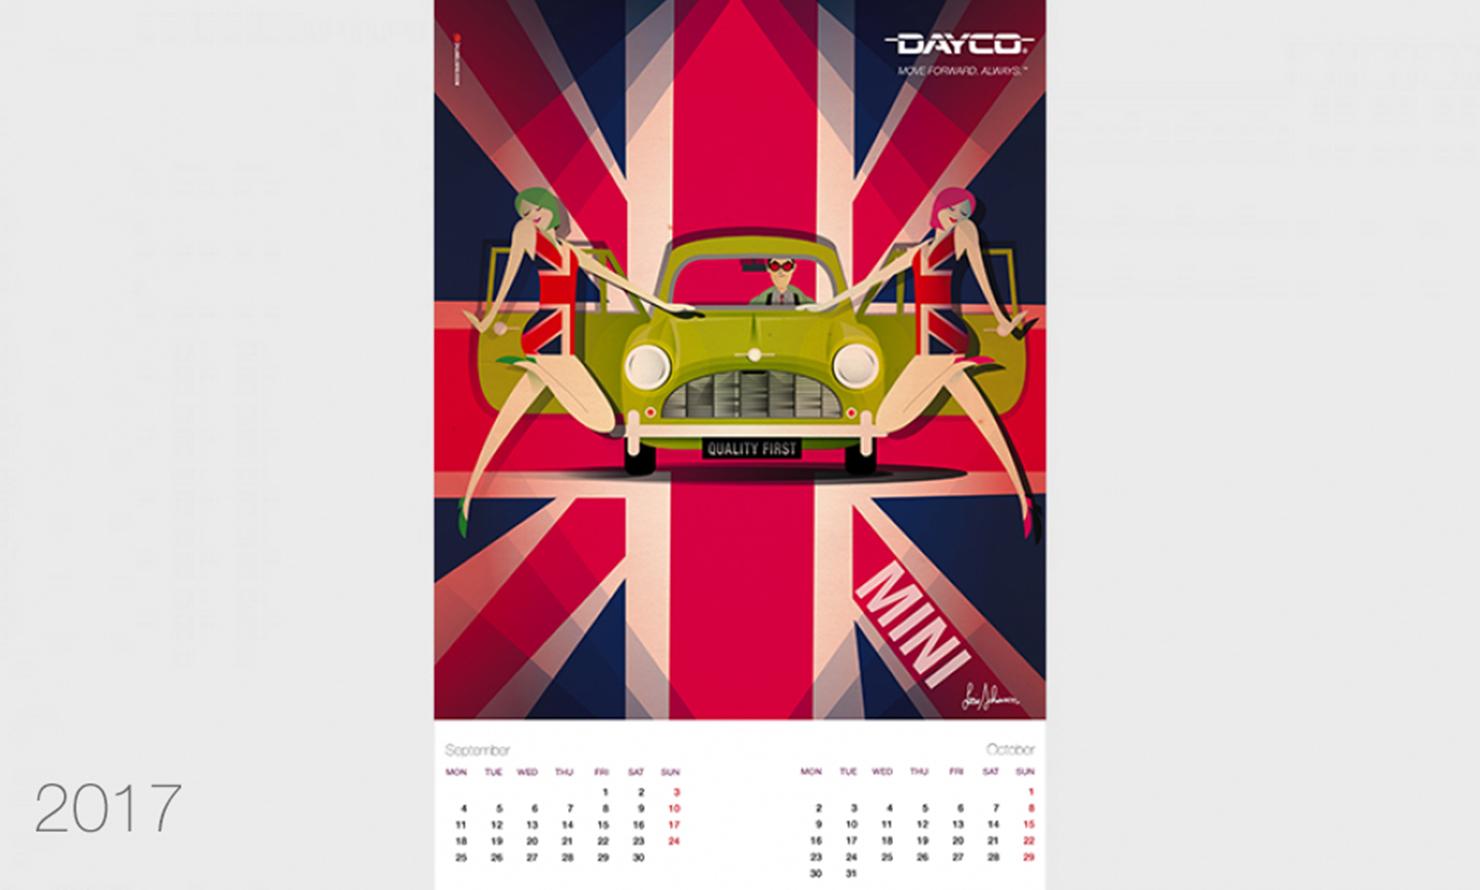 https://www.kubelibre.com/uploads/Slider-work-tutti-clienti/dayco-calendario-2017-5.jpg